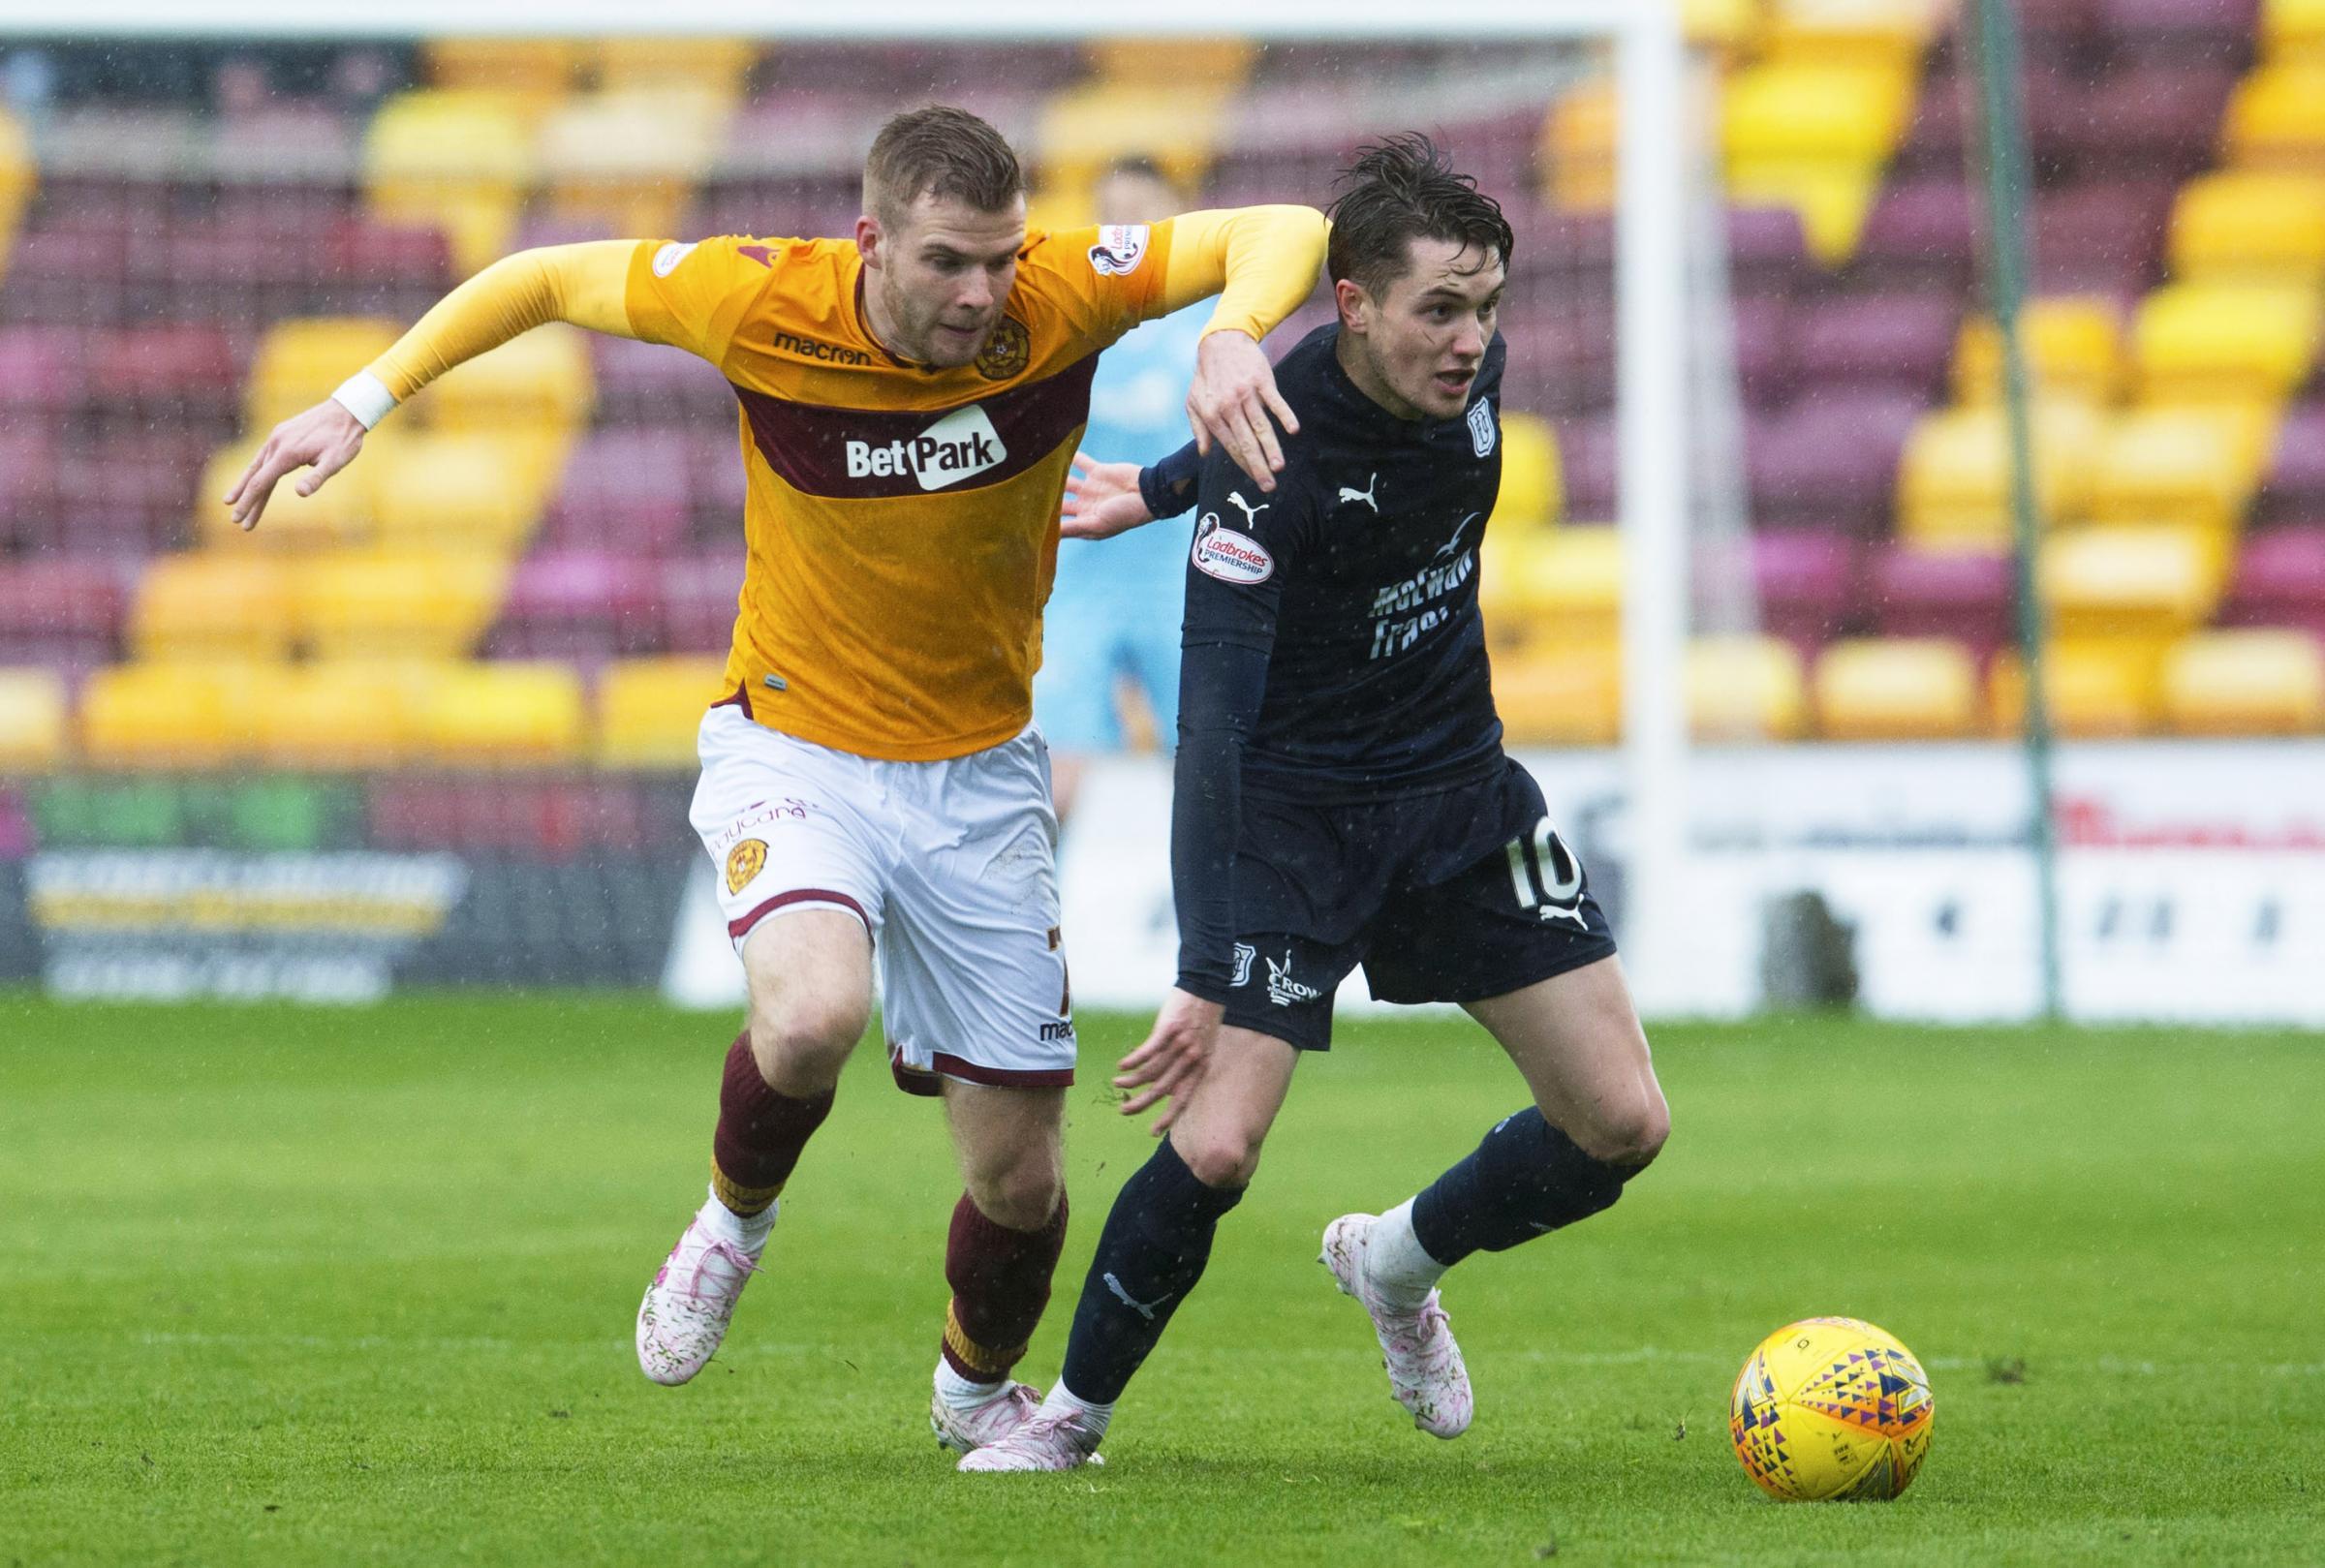 Aberdeen striker Scott Wright out for 'rest of season' after horror cruciate injury